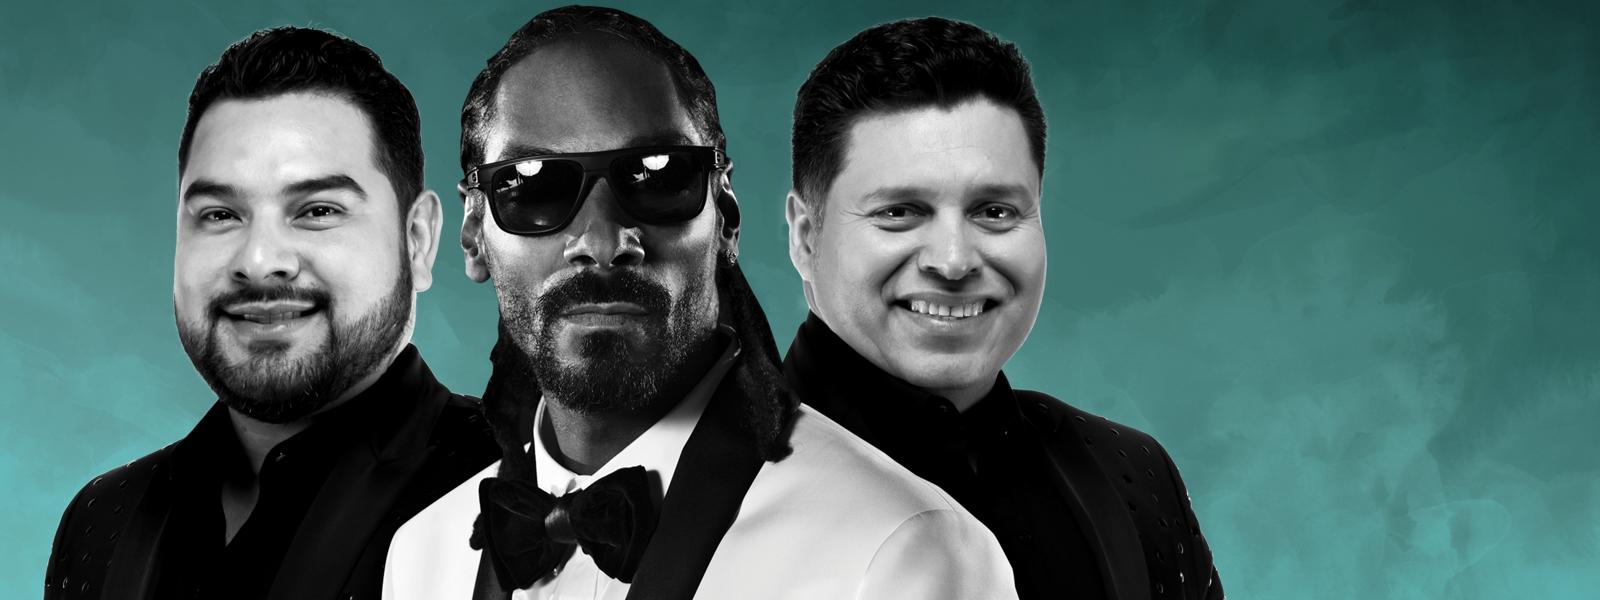 Banda Ms Taps Hip Hop Legend Snoop Dogg For New Single Qué Maldición